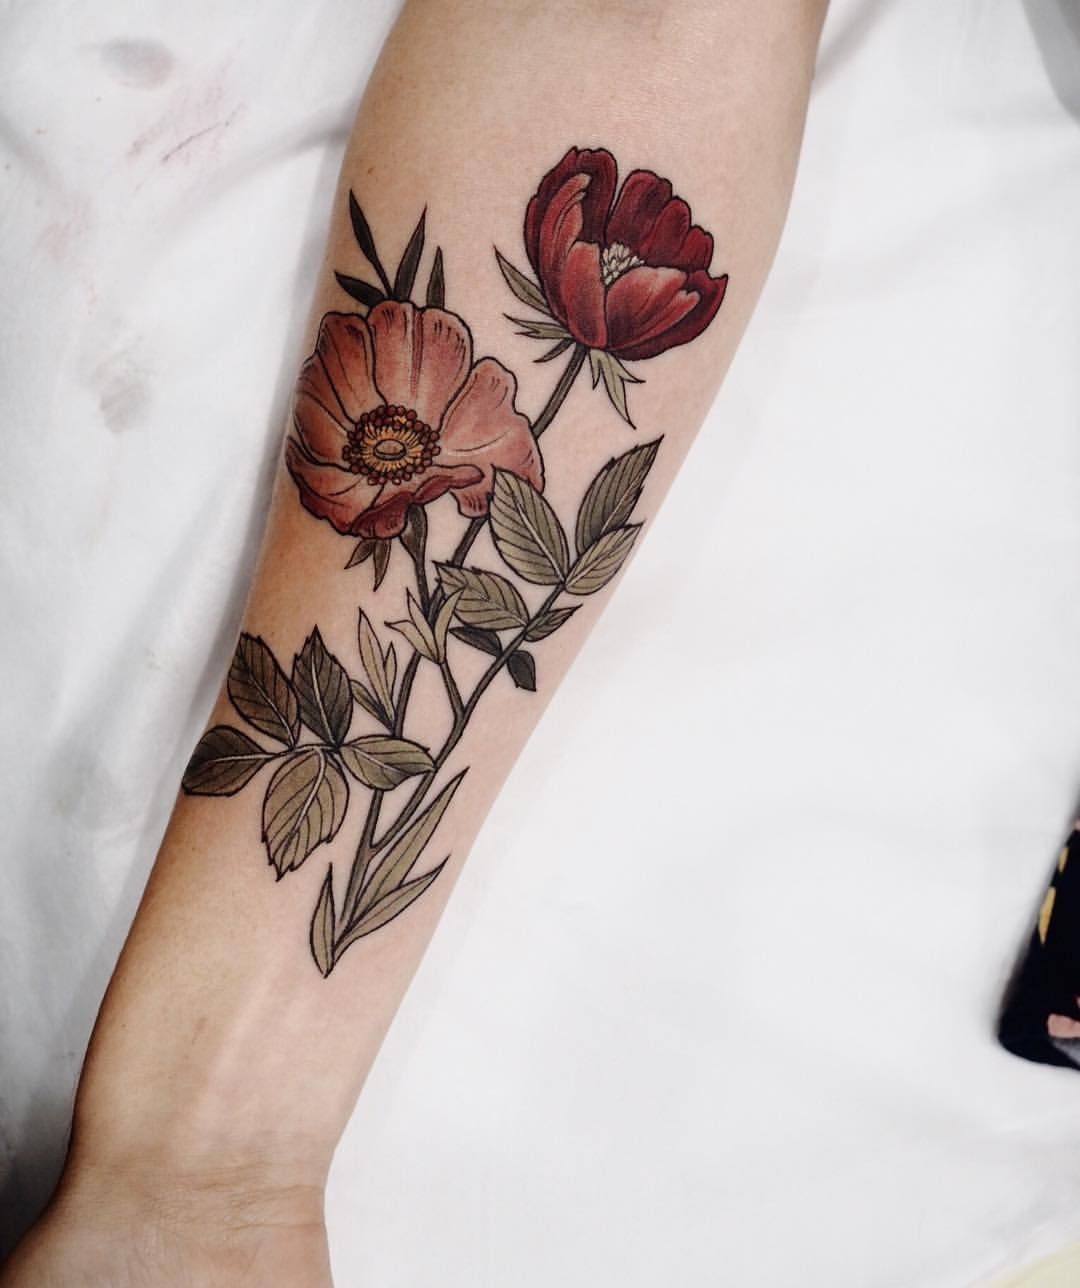 Sophia Baughan Tattoo Wild Rose And Poppy Body Tattoos Vintage Tattoo Tattoos